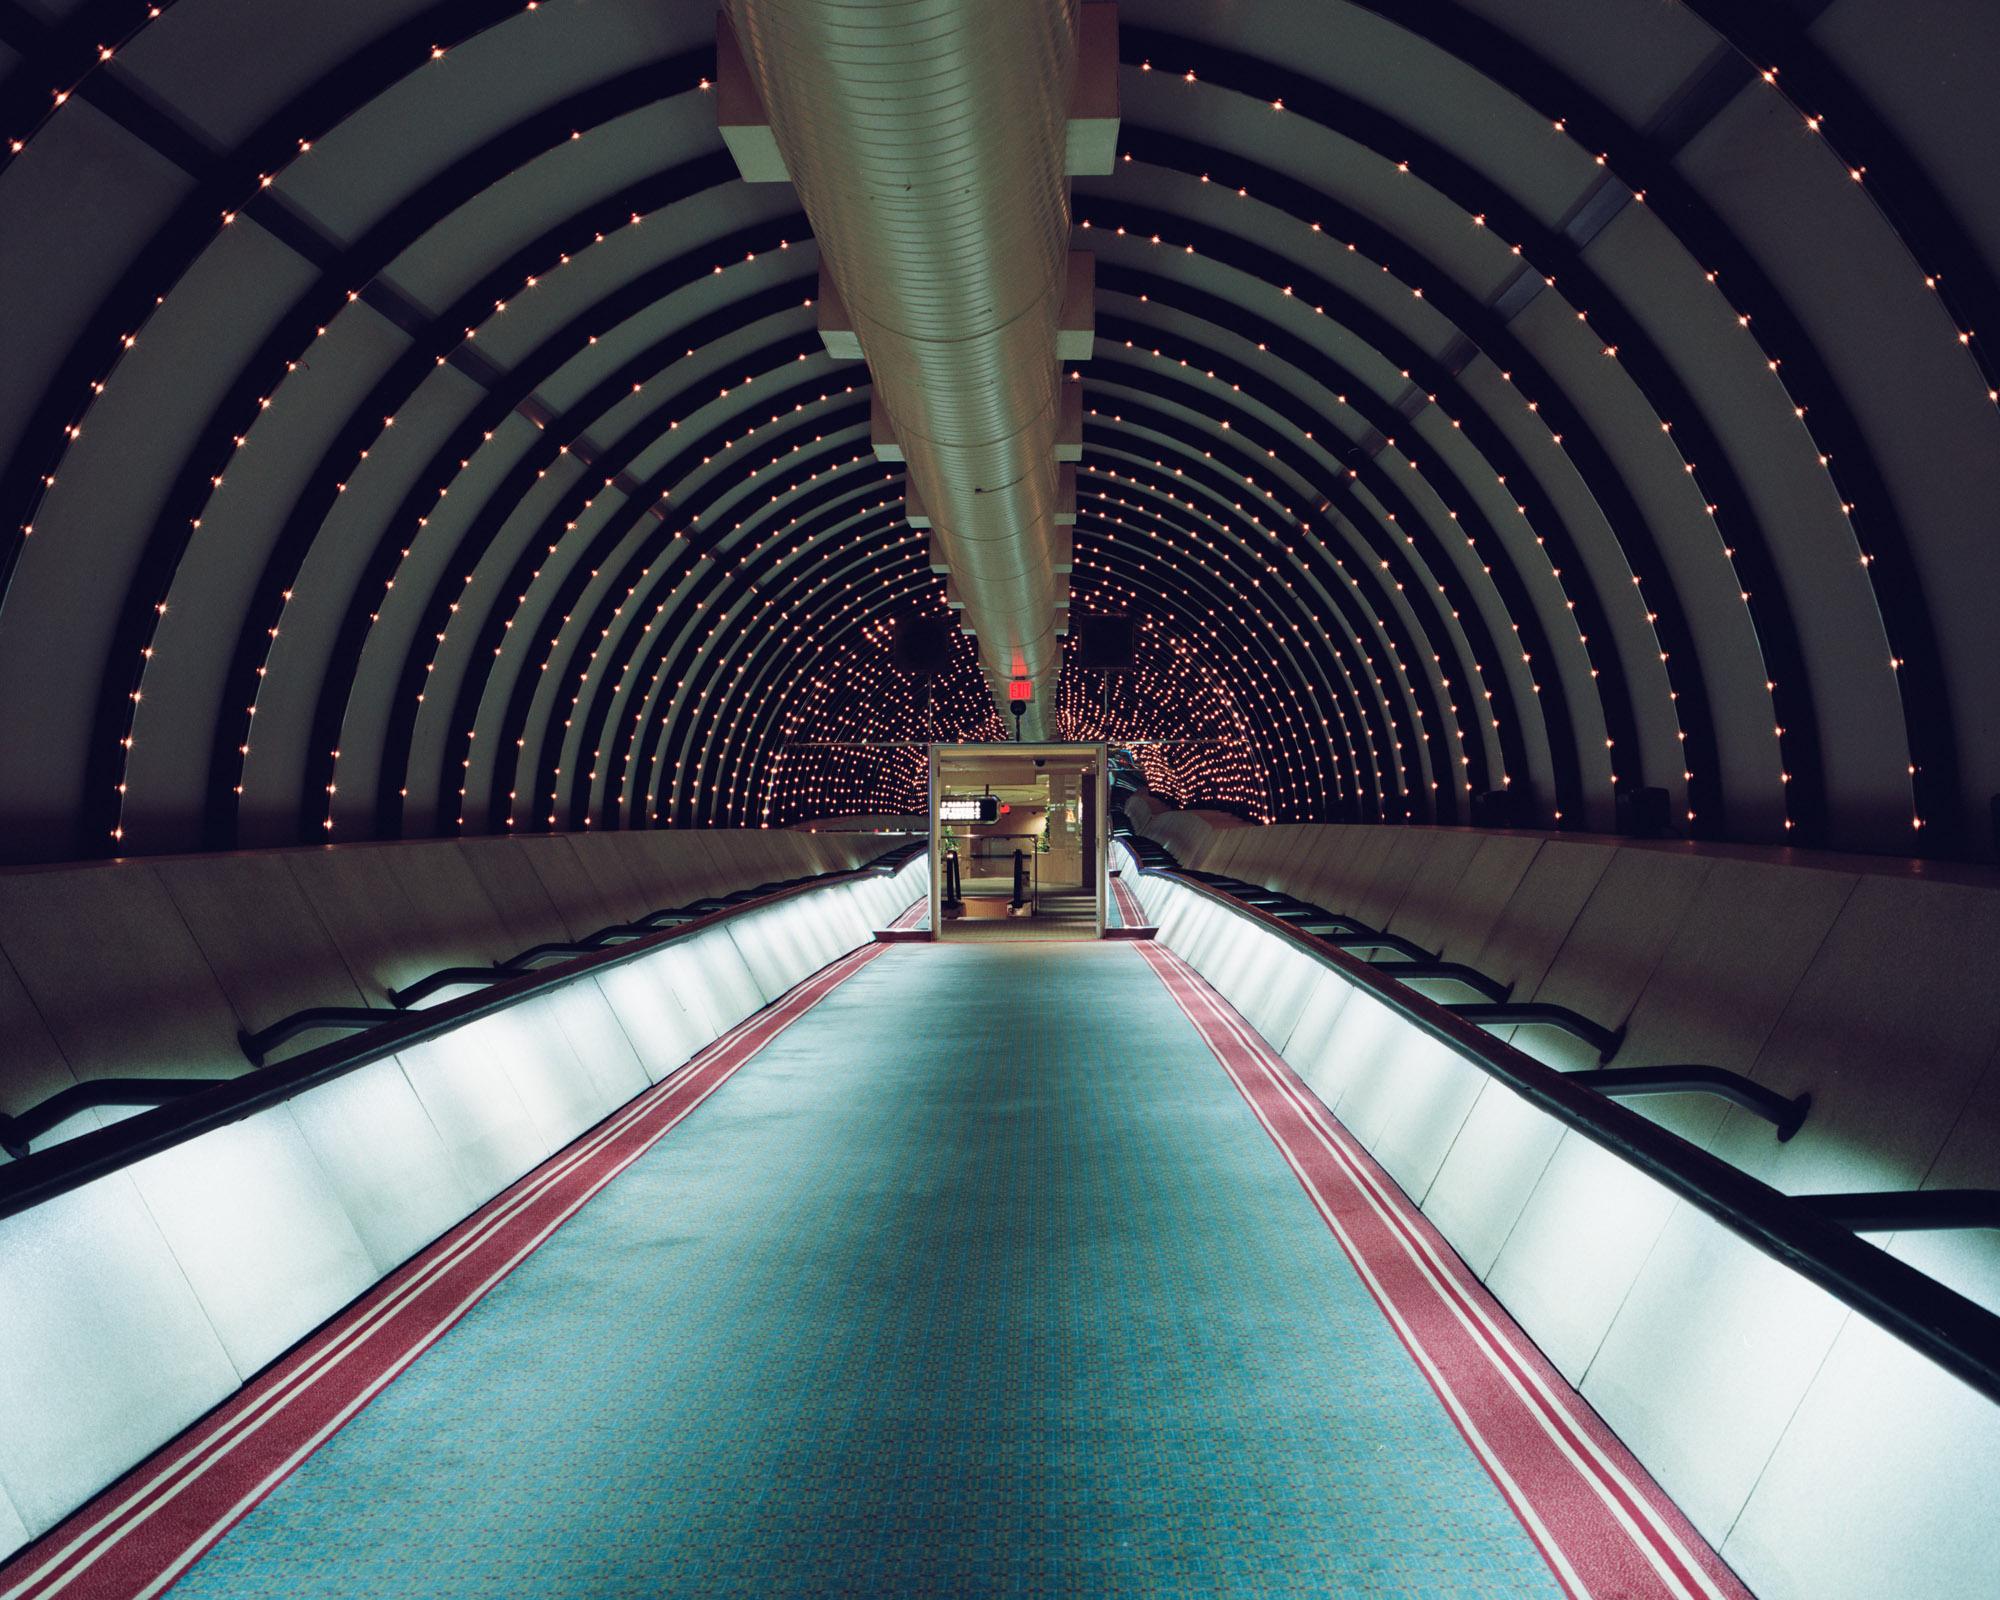 20_resorts hallway 1 (1)-.jpg